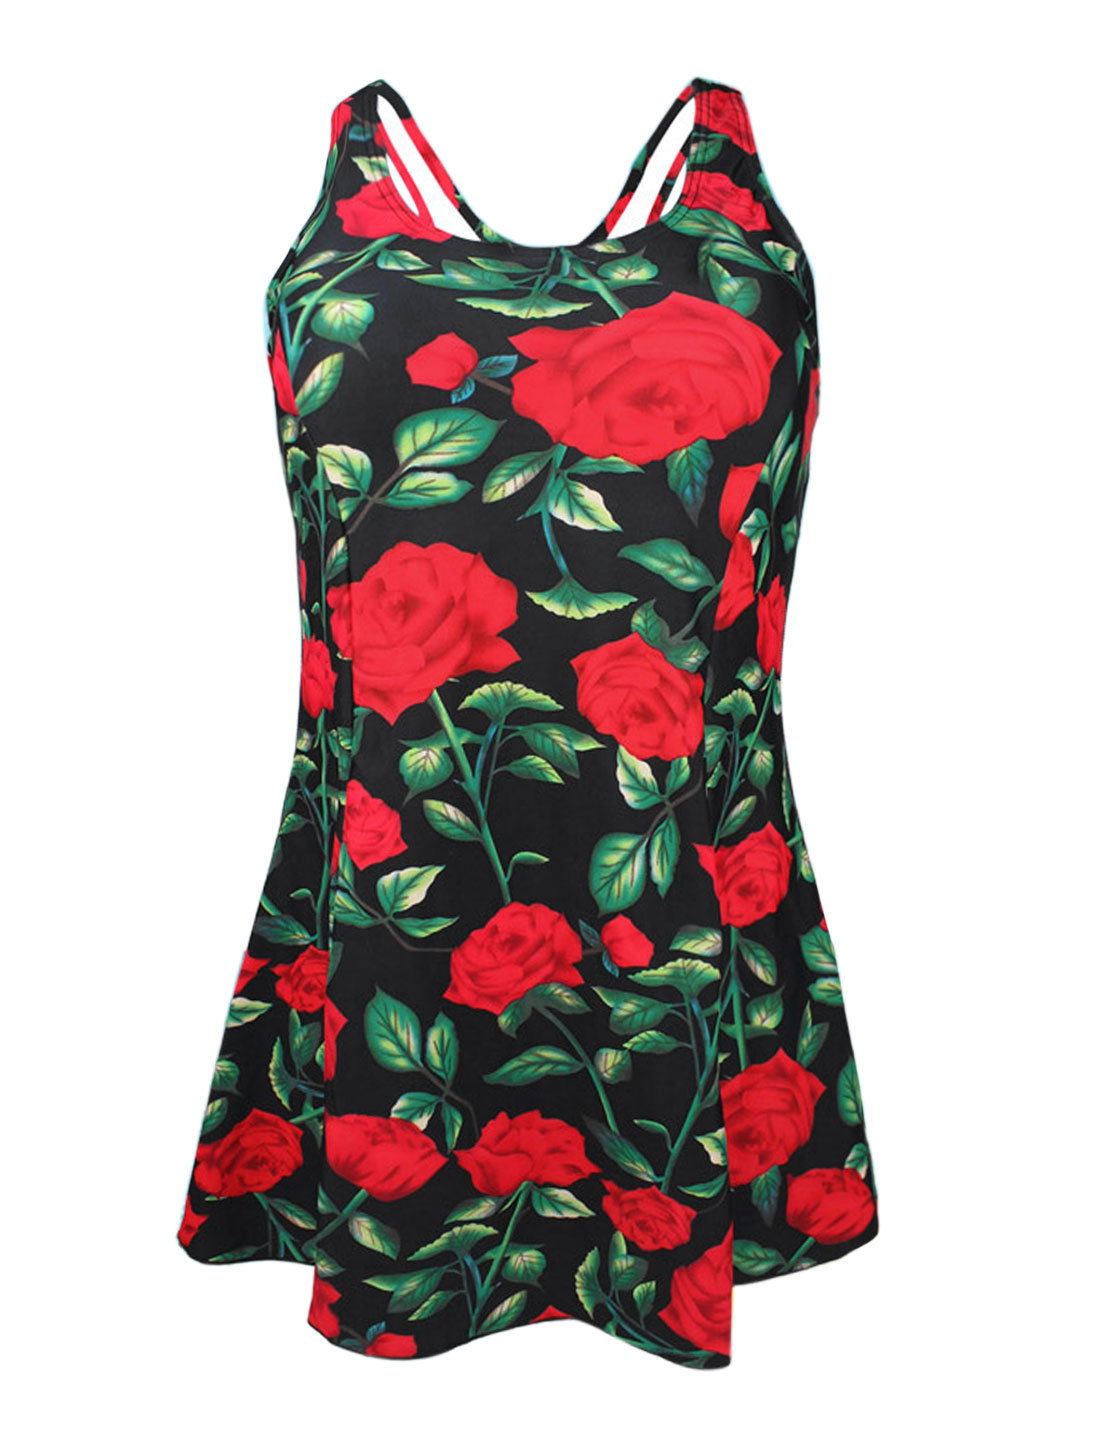 Women Vintage One Piece Floral Print Slim Bathing Suit Swimsuit Swimdress US L Cover Up